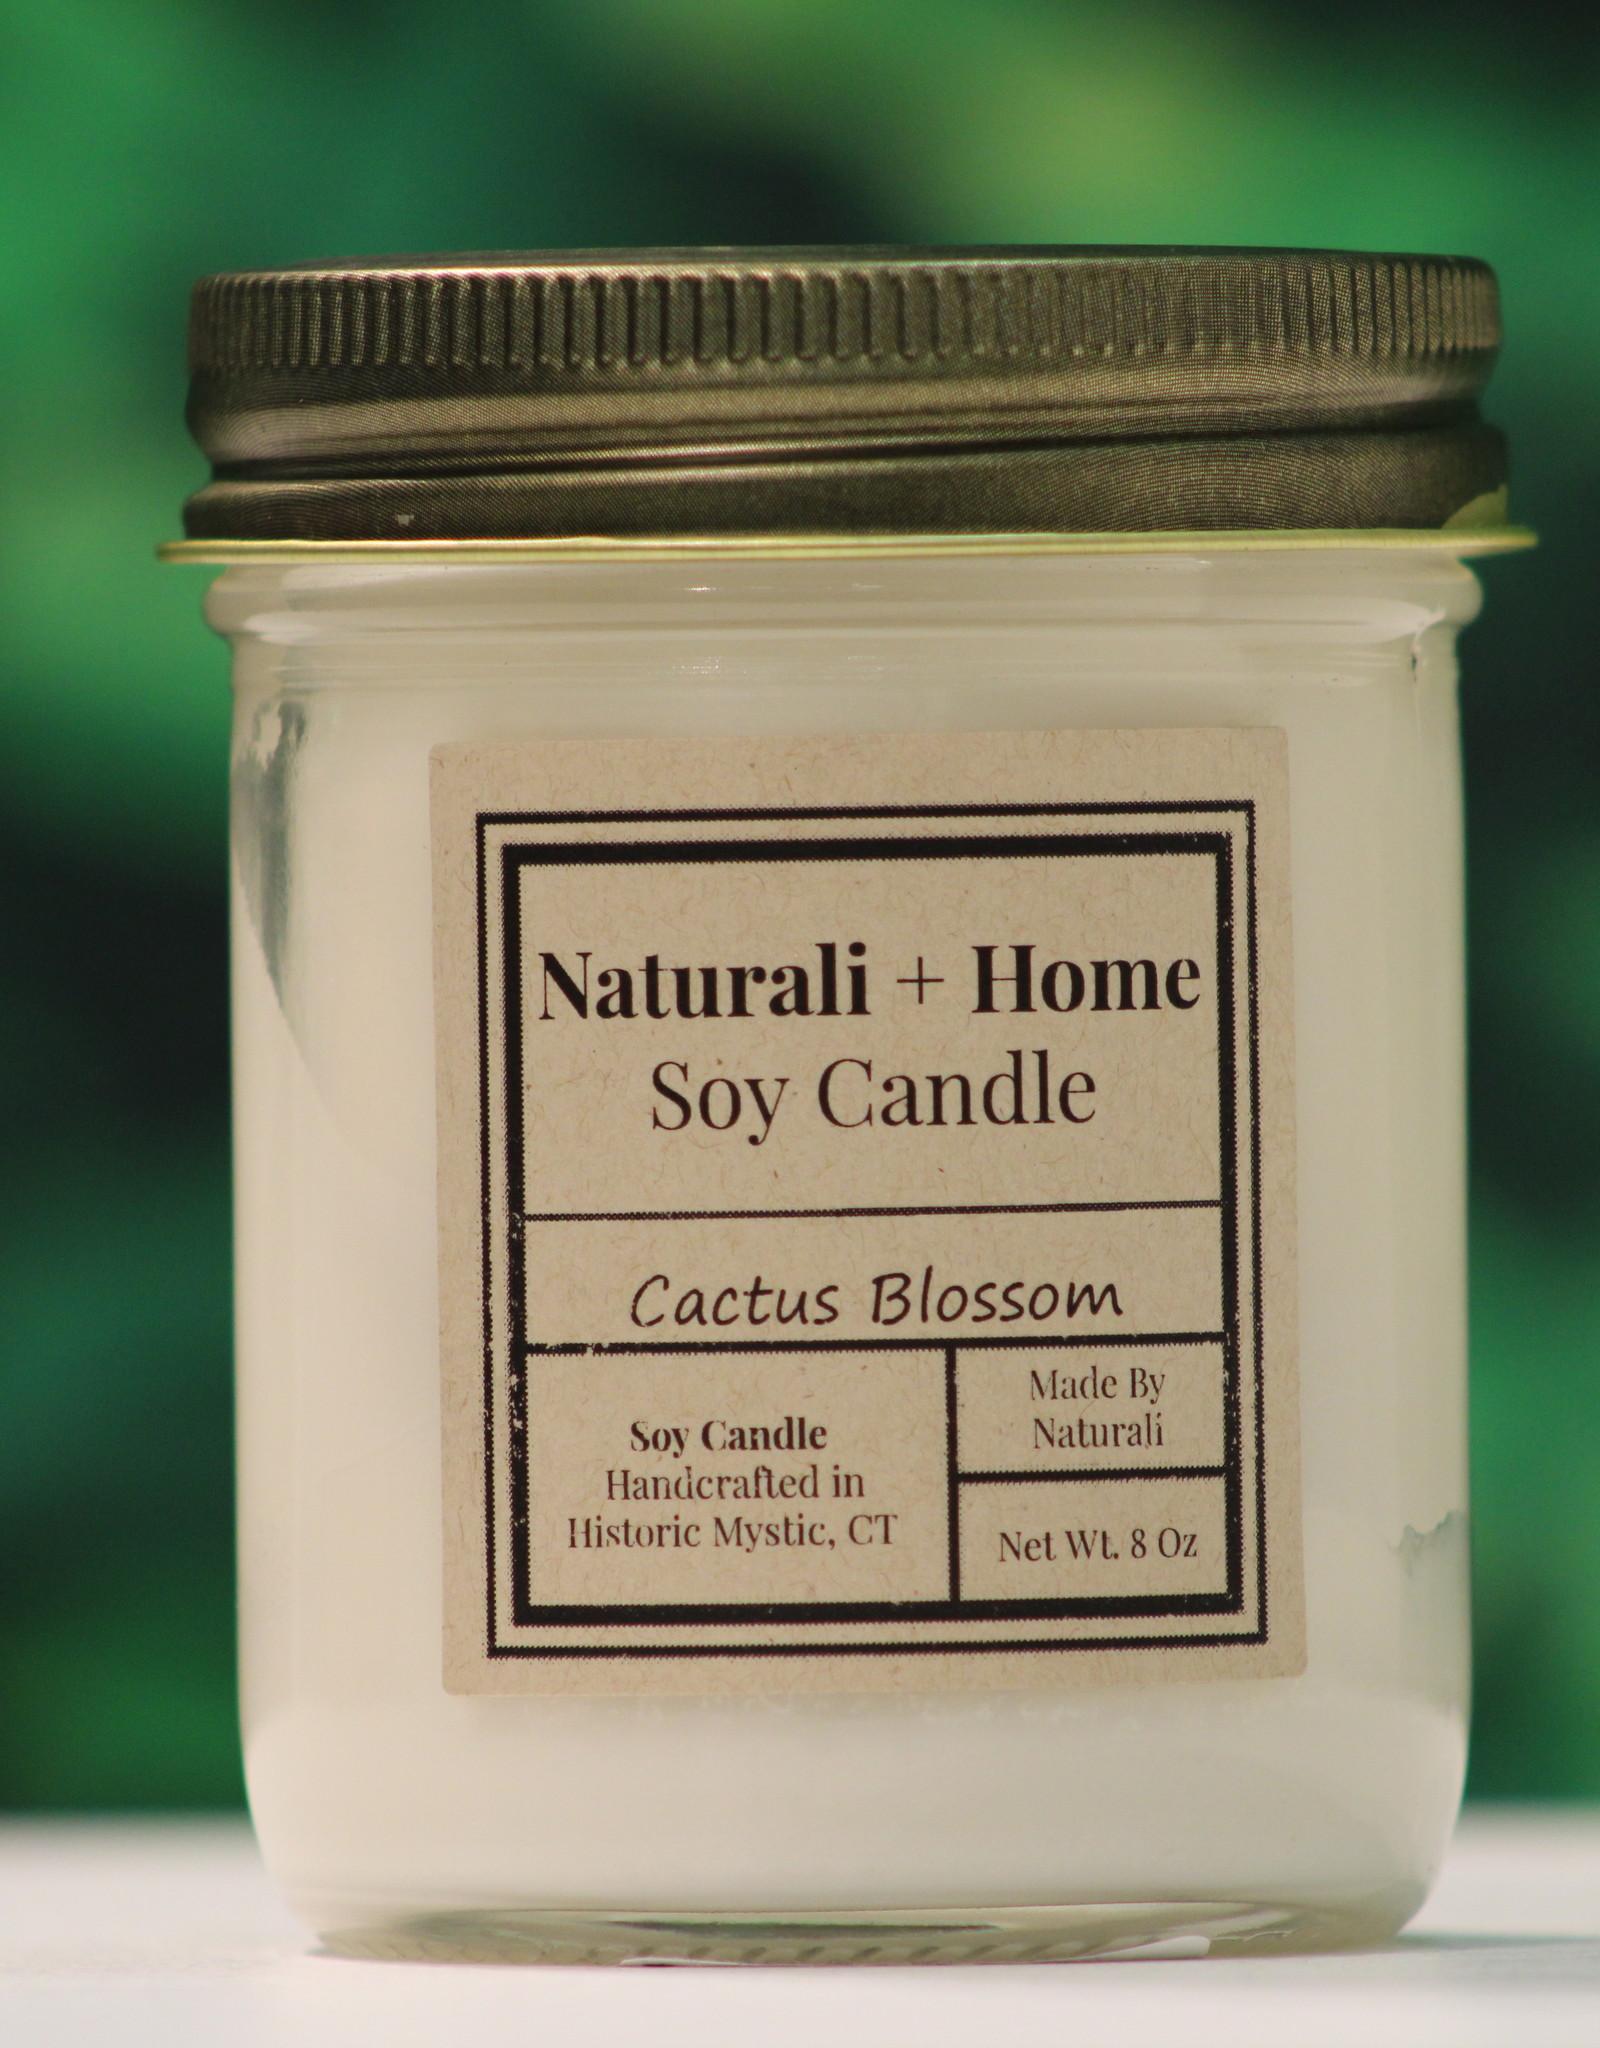 Naturali Home Cactus Blossom Soy Candle (8oz)